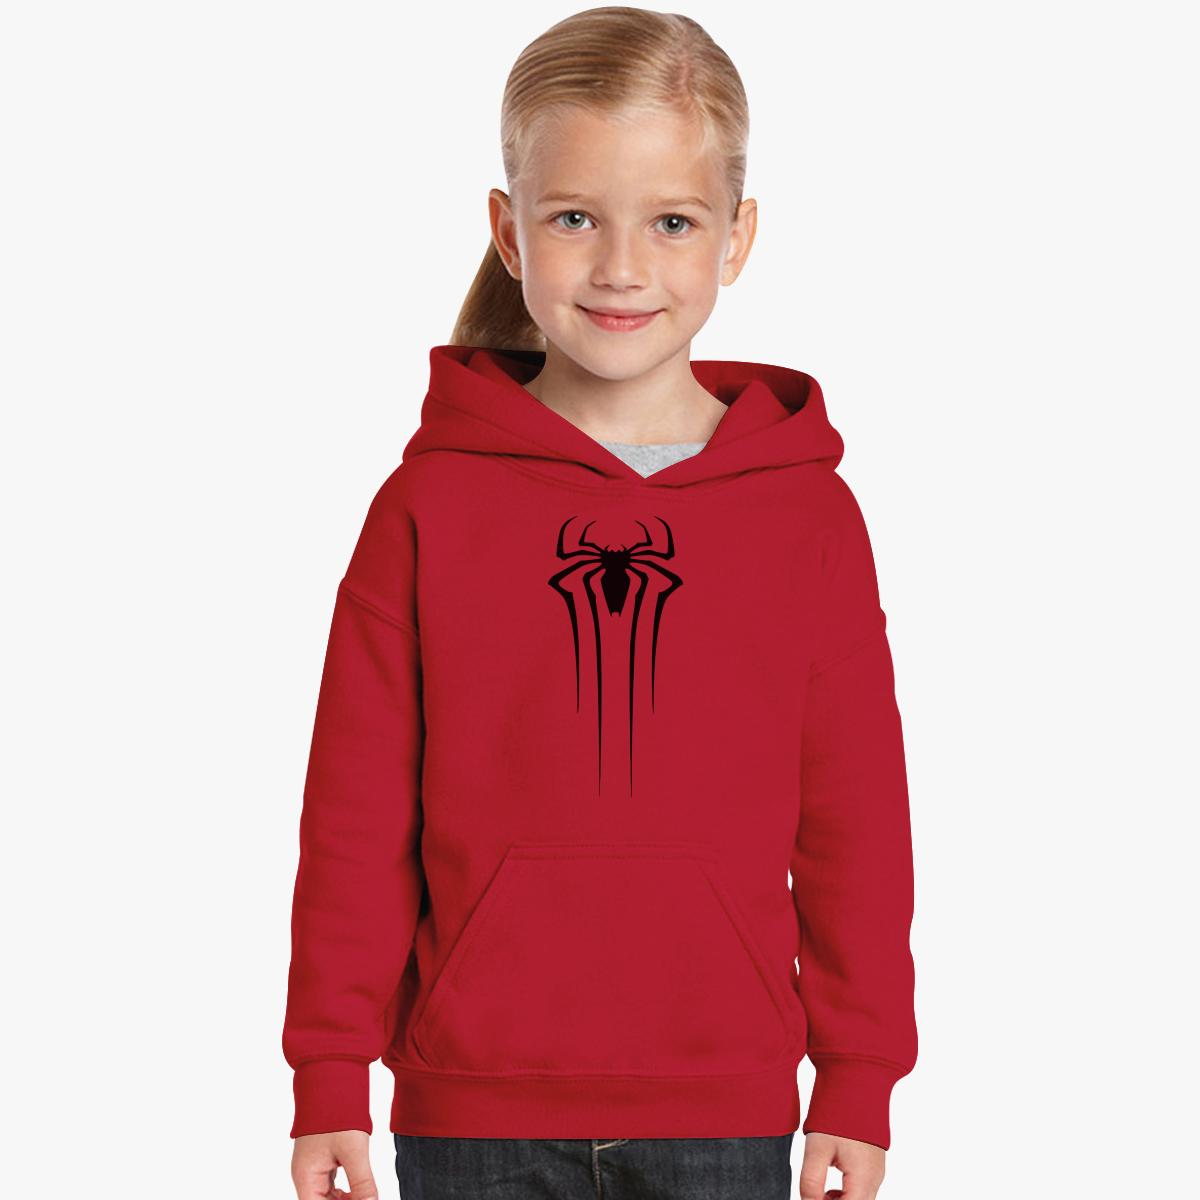 Spider-Man Kids Hoodie